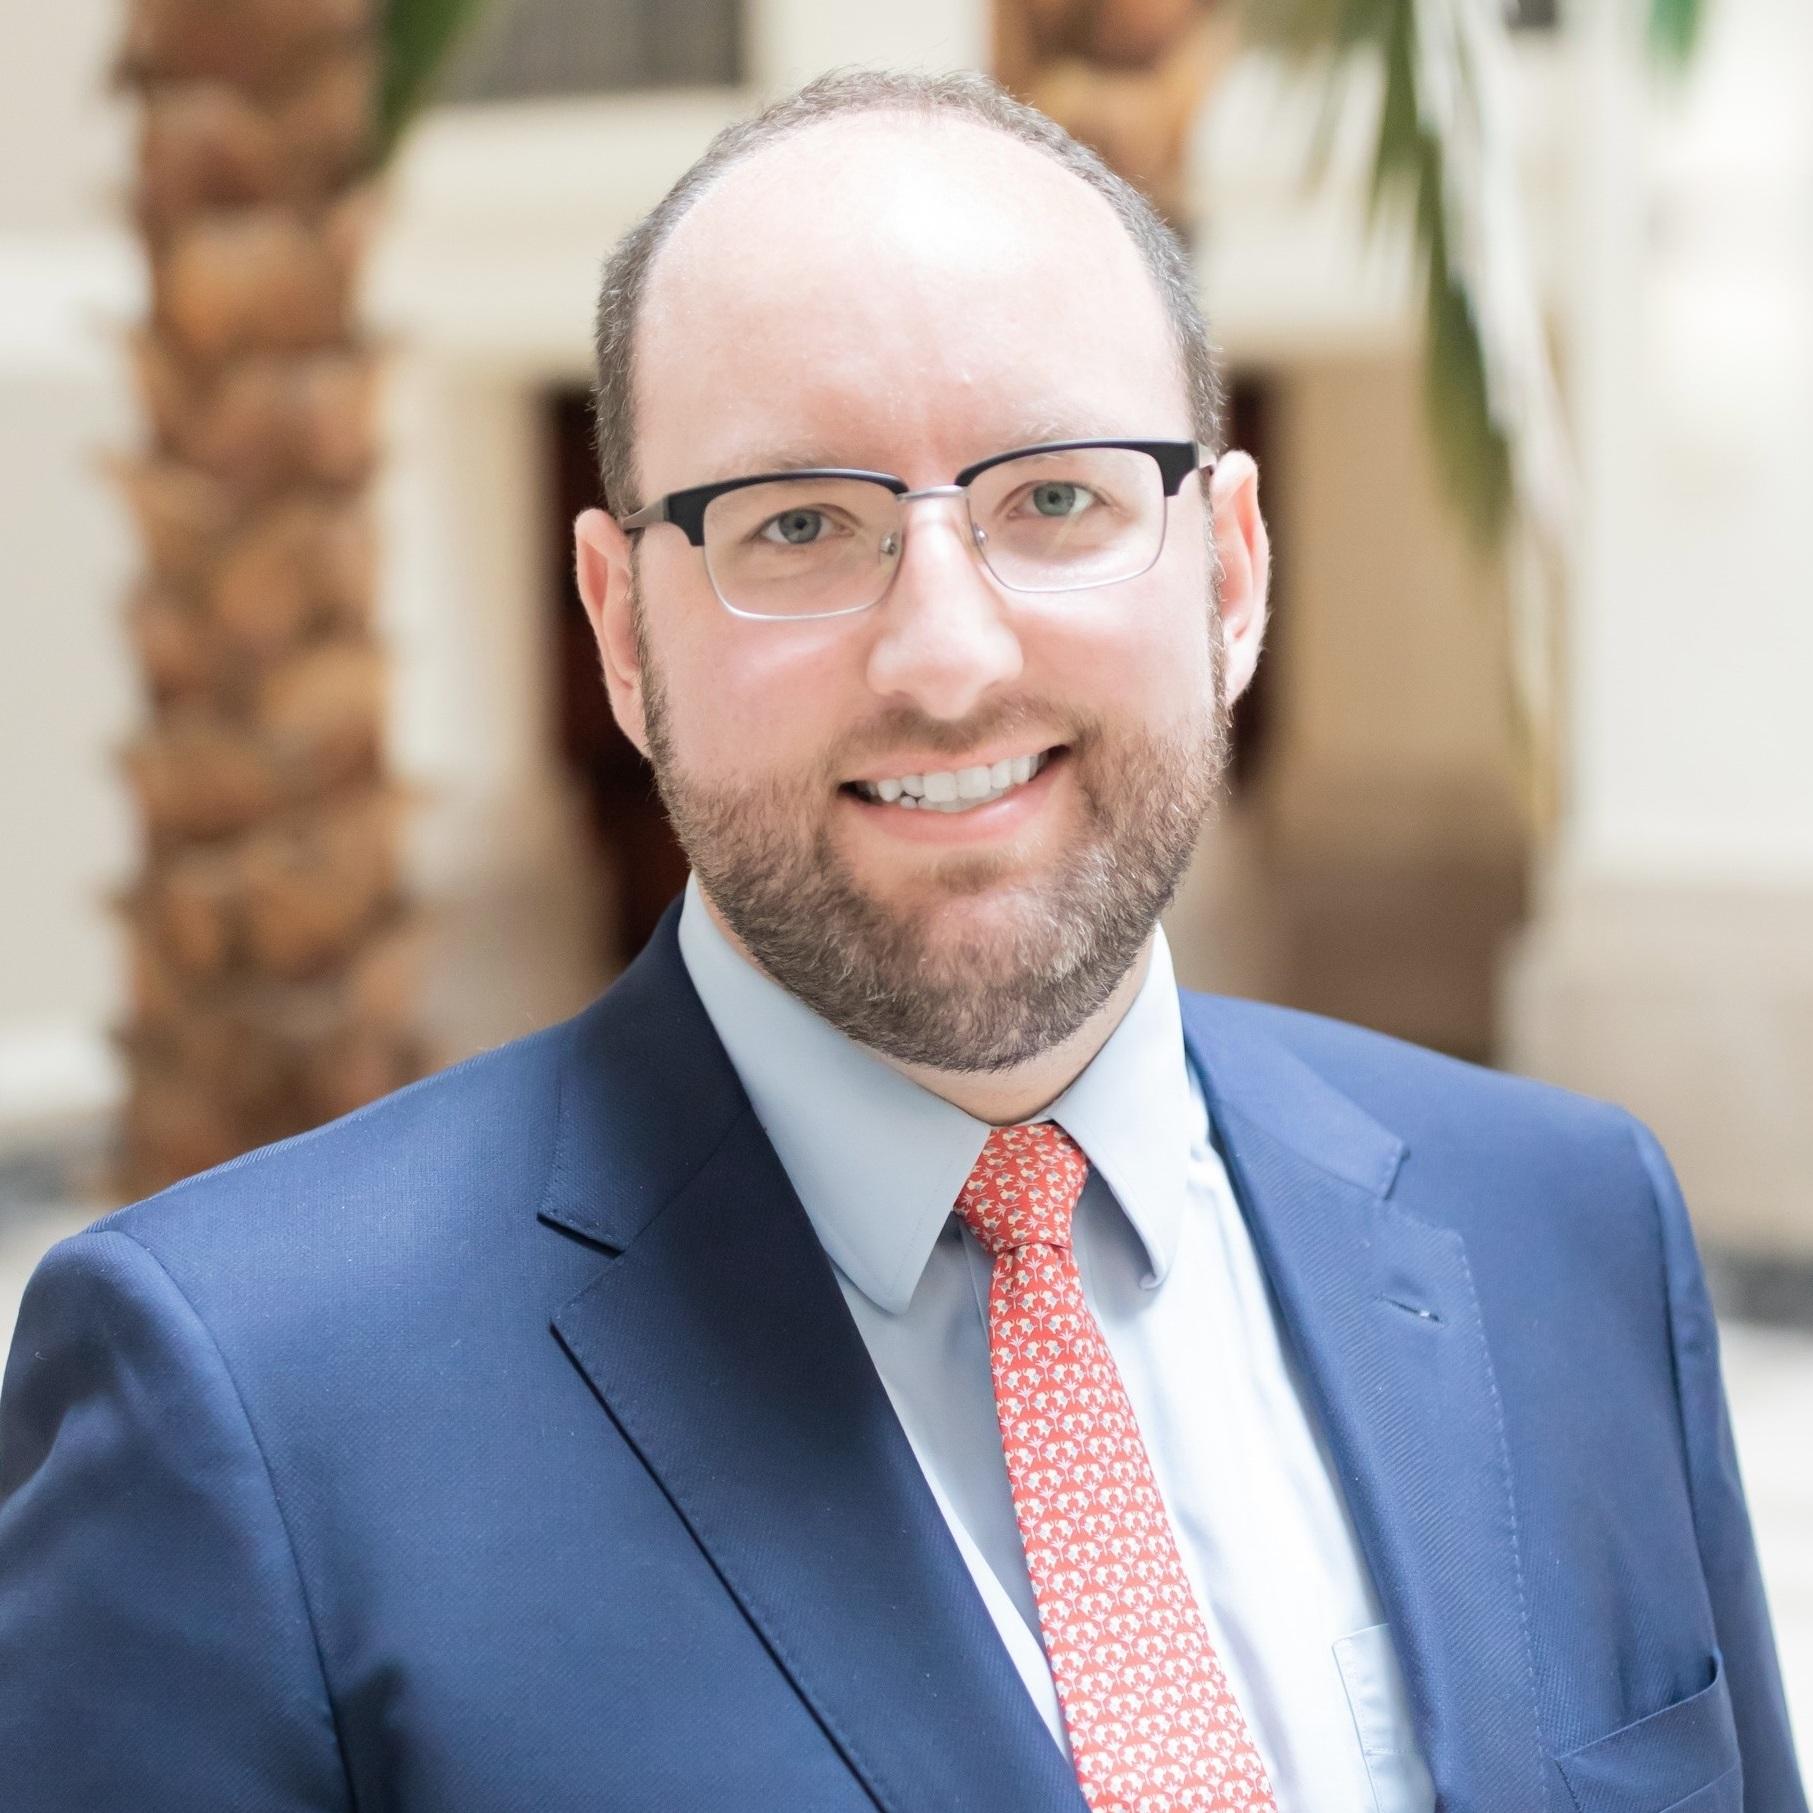 Dan Mahaffee - Senior Vice President & Director of Policy, CSPC